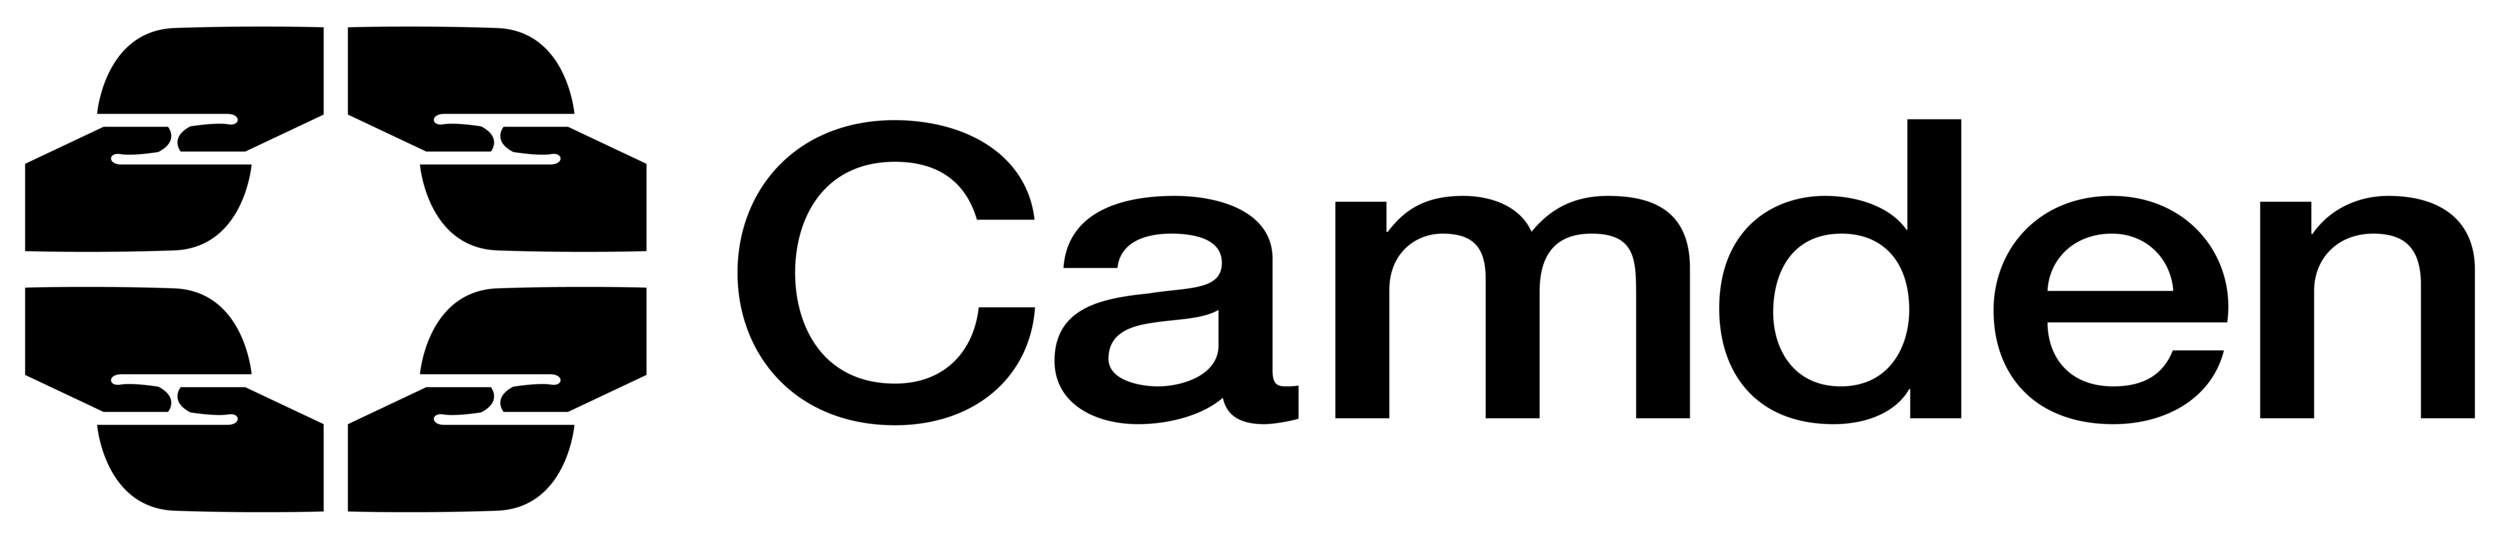 Camden logo .png